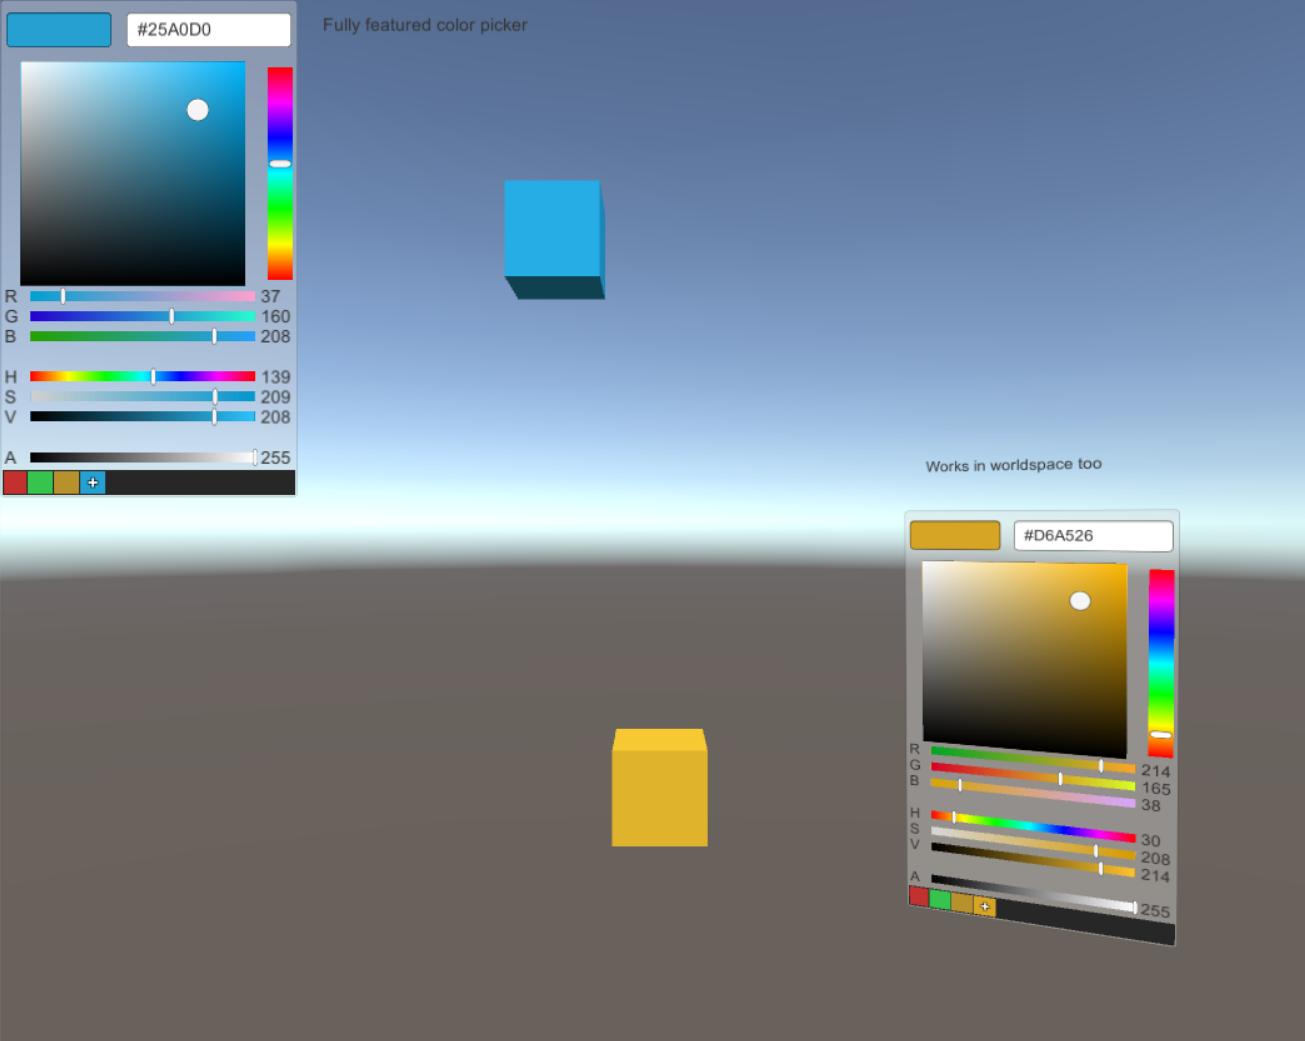 GitHub - judah4/HSV-Color-Picker-Unity: HSV color picker for